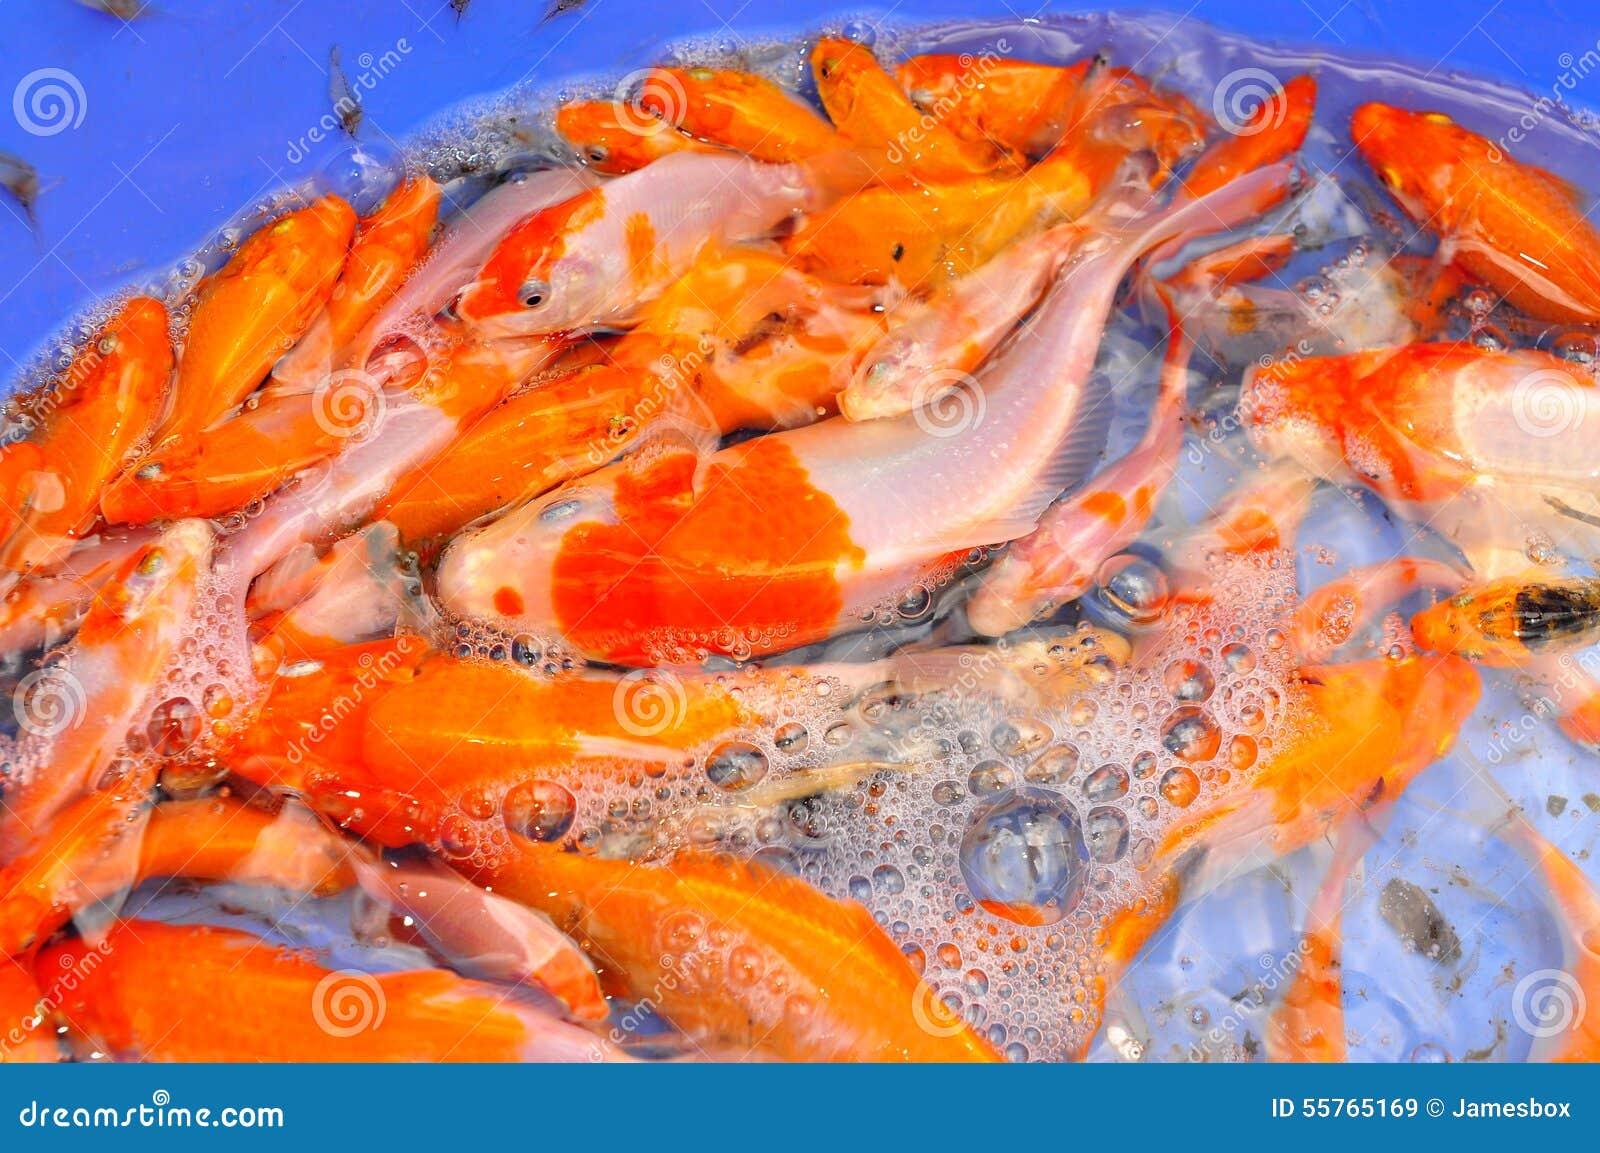 Koi fish in aquarium care - Broodstocks Of Koi Fish In Tank In A Farming Center In Vietnam Editorial Stock Image